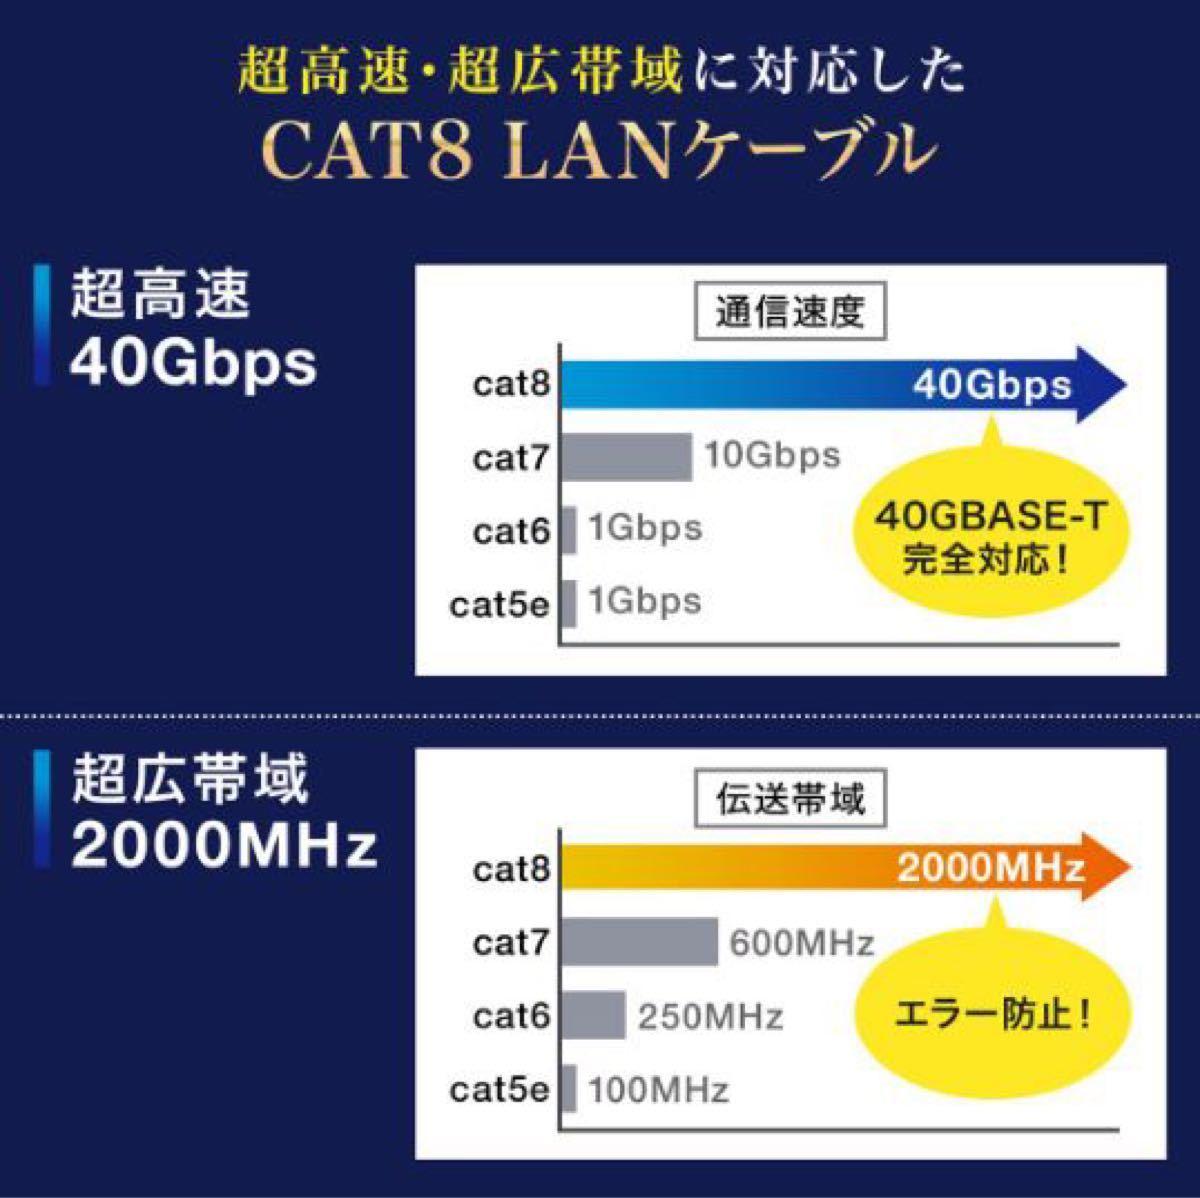 LANケーブル 2m CAT8 40ギガビット 超高速通信対応新品未使用光回線